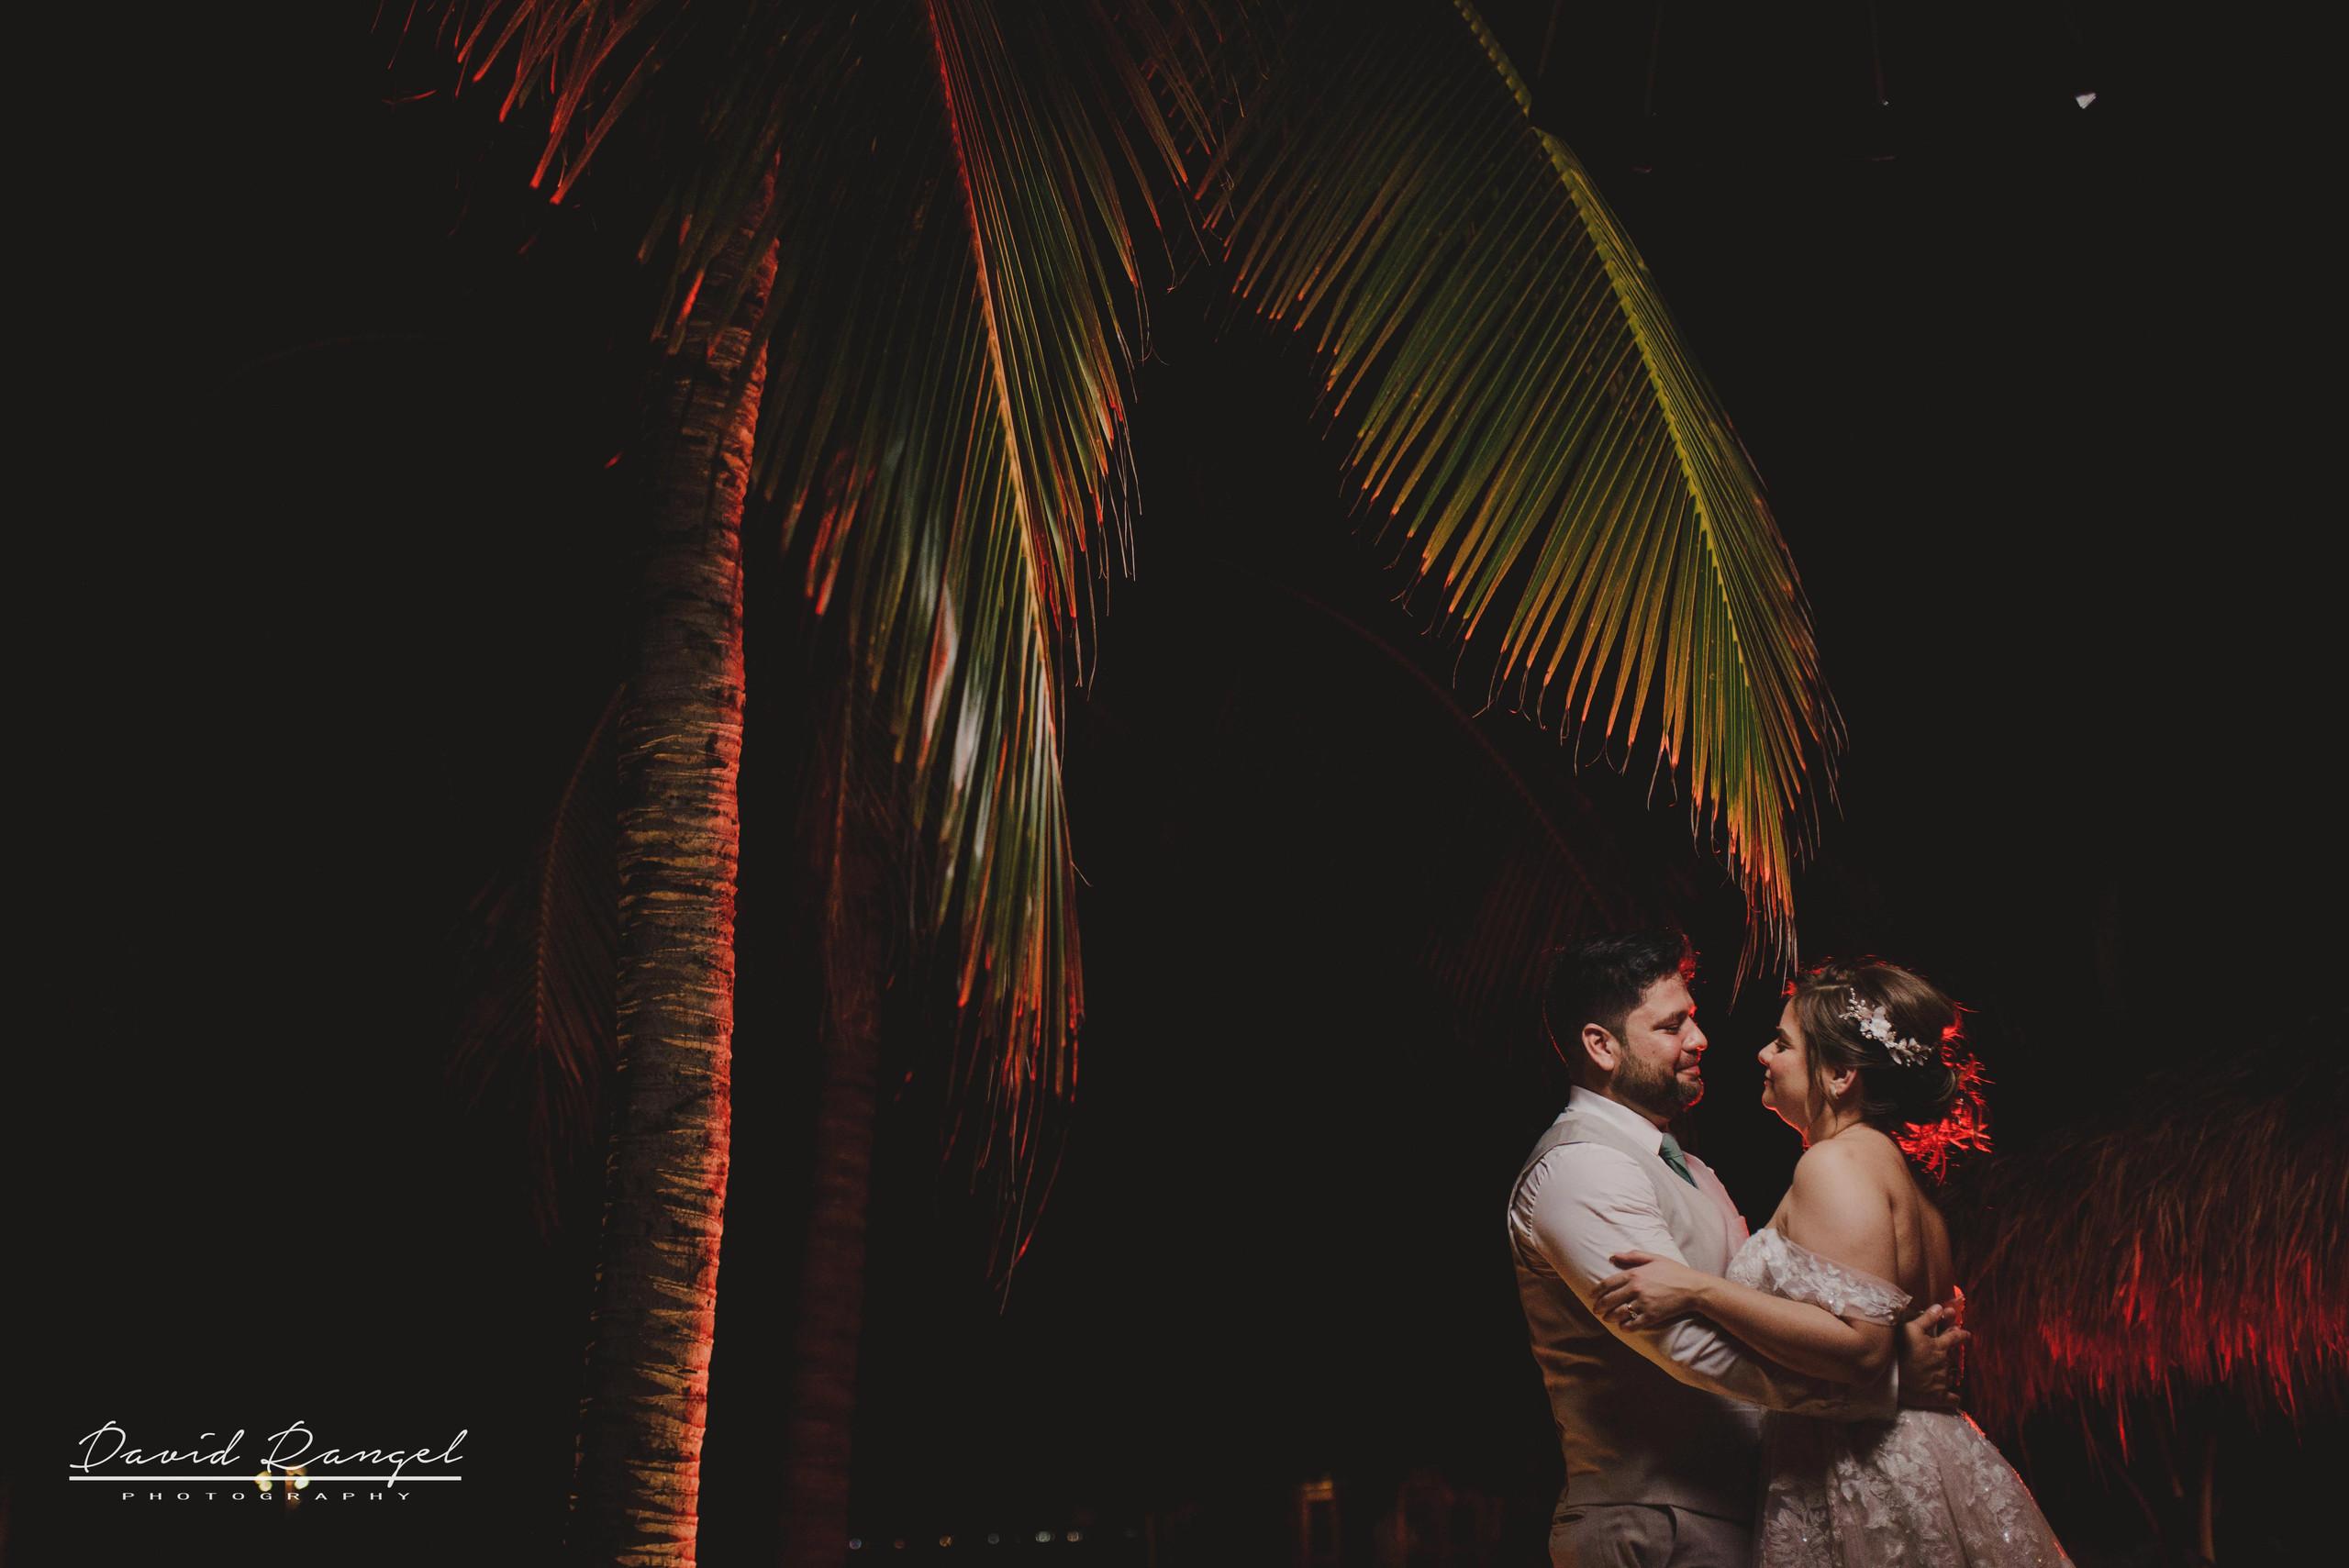 bride+groom+beach+session+happy+love+couple+celebration+wedding+photo+beach+caribean+sea+photographer+david+rangel+dress+suit+villa+chenera+main+entrance+reception+kiss+back+light